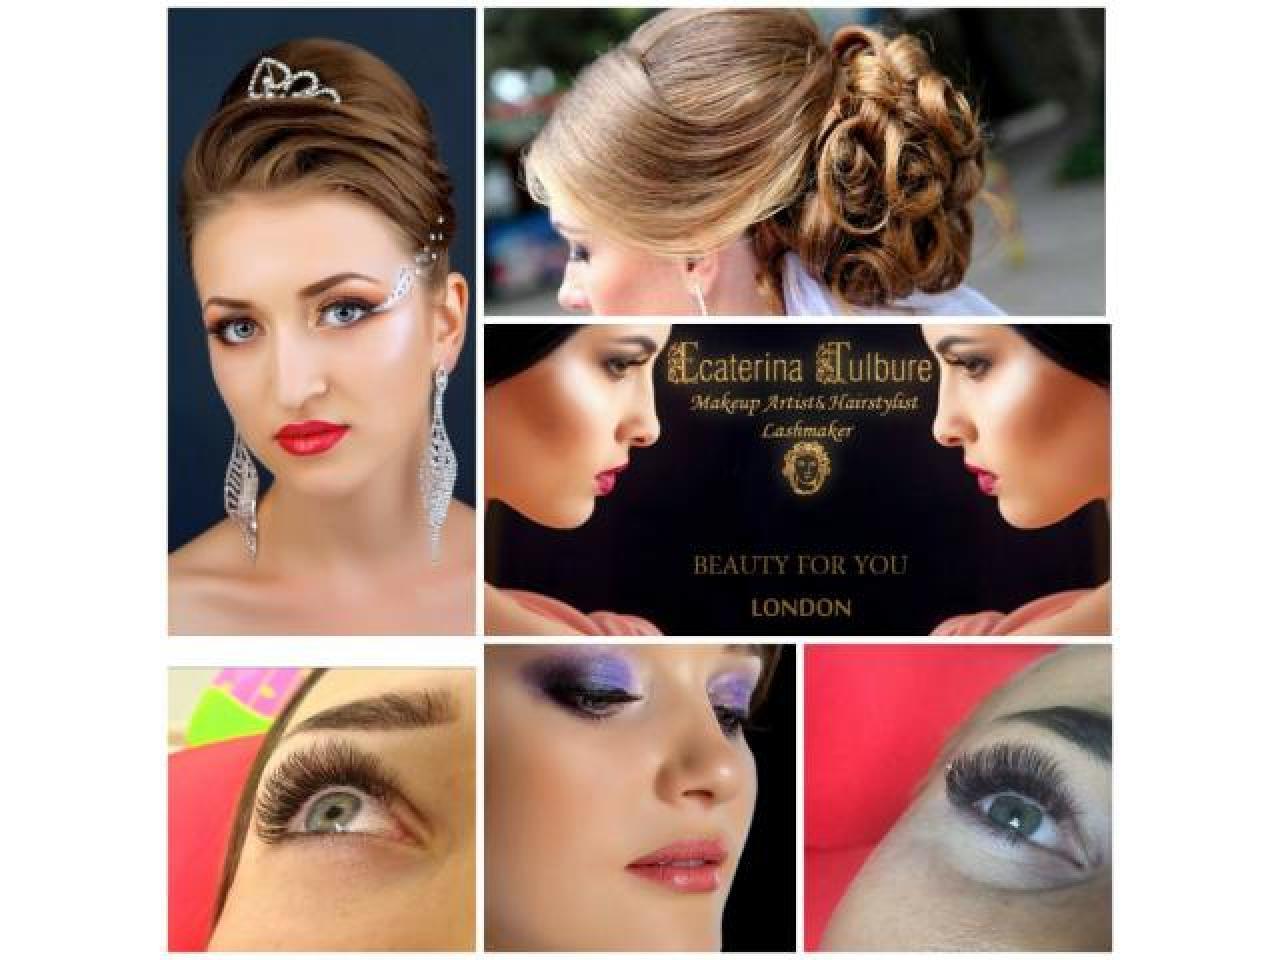 макияж, прически, наращивание ресниц. Makeup, Hairstyle, Eyelash extensions - 1